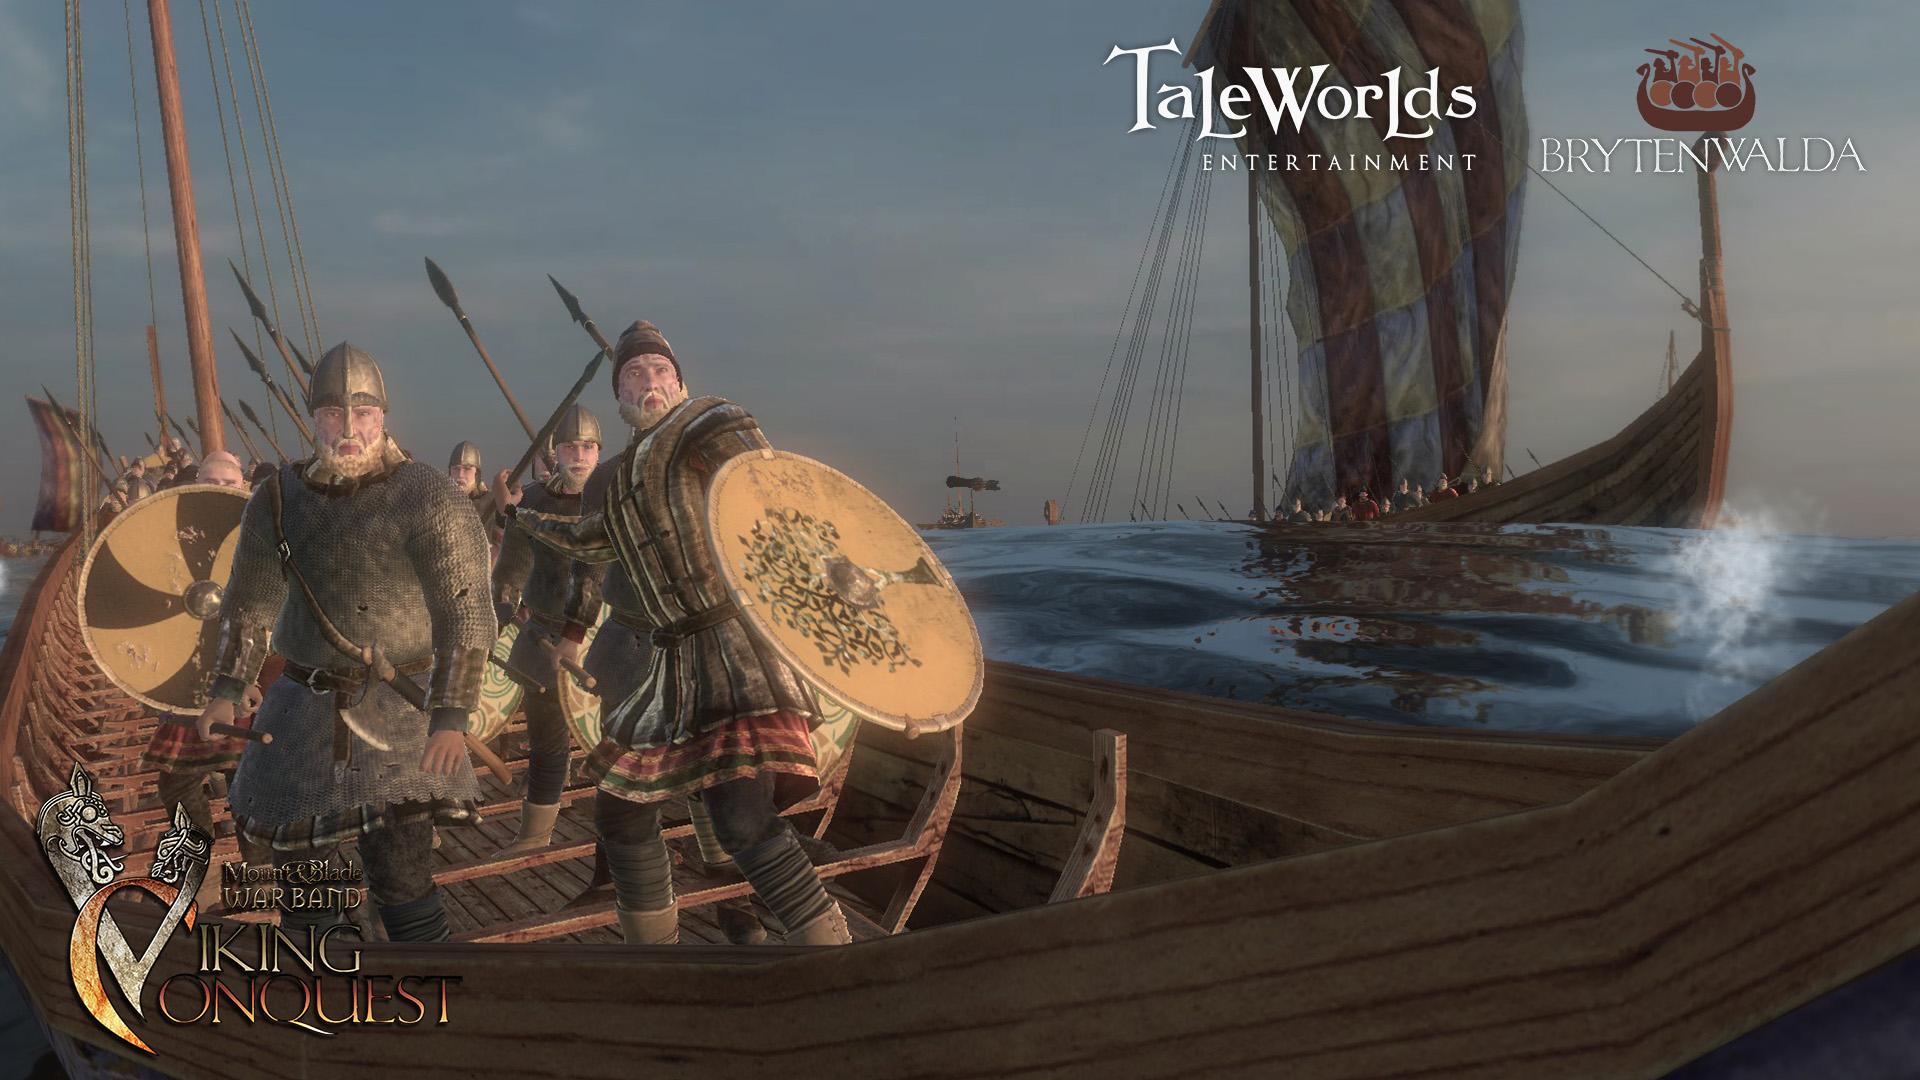 Viking Conquest: discusión general - Página 5 2b821f174401f28390f0f7241b90f4ae3e915c9f